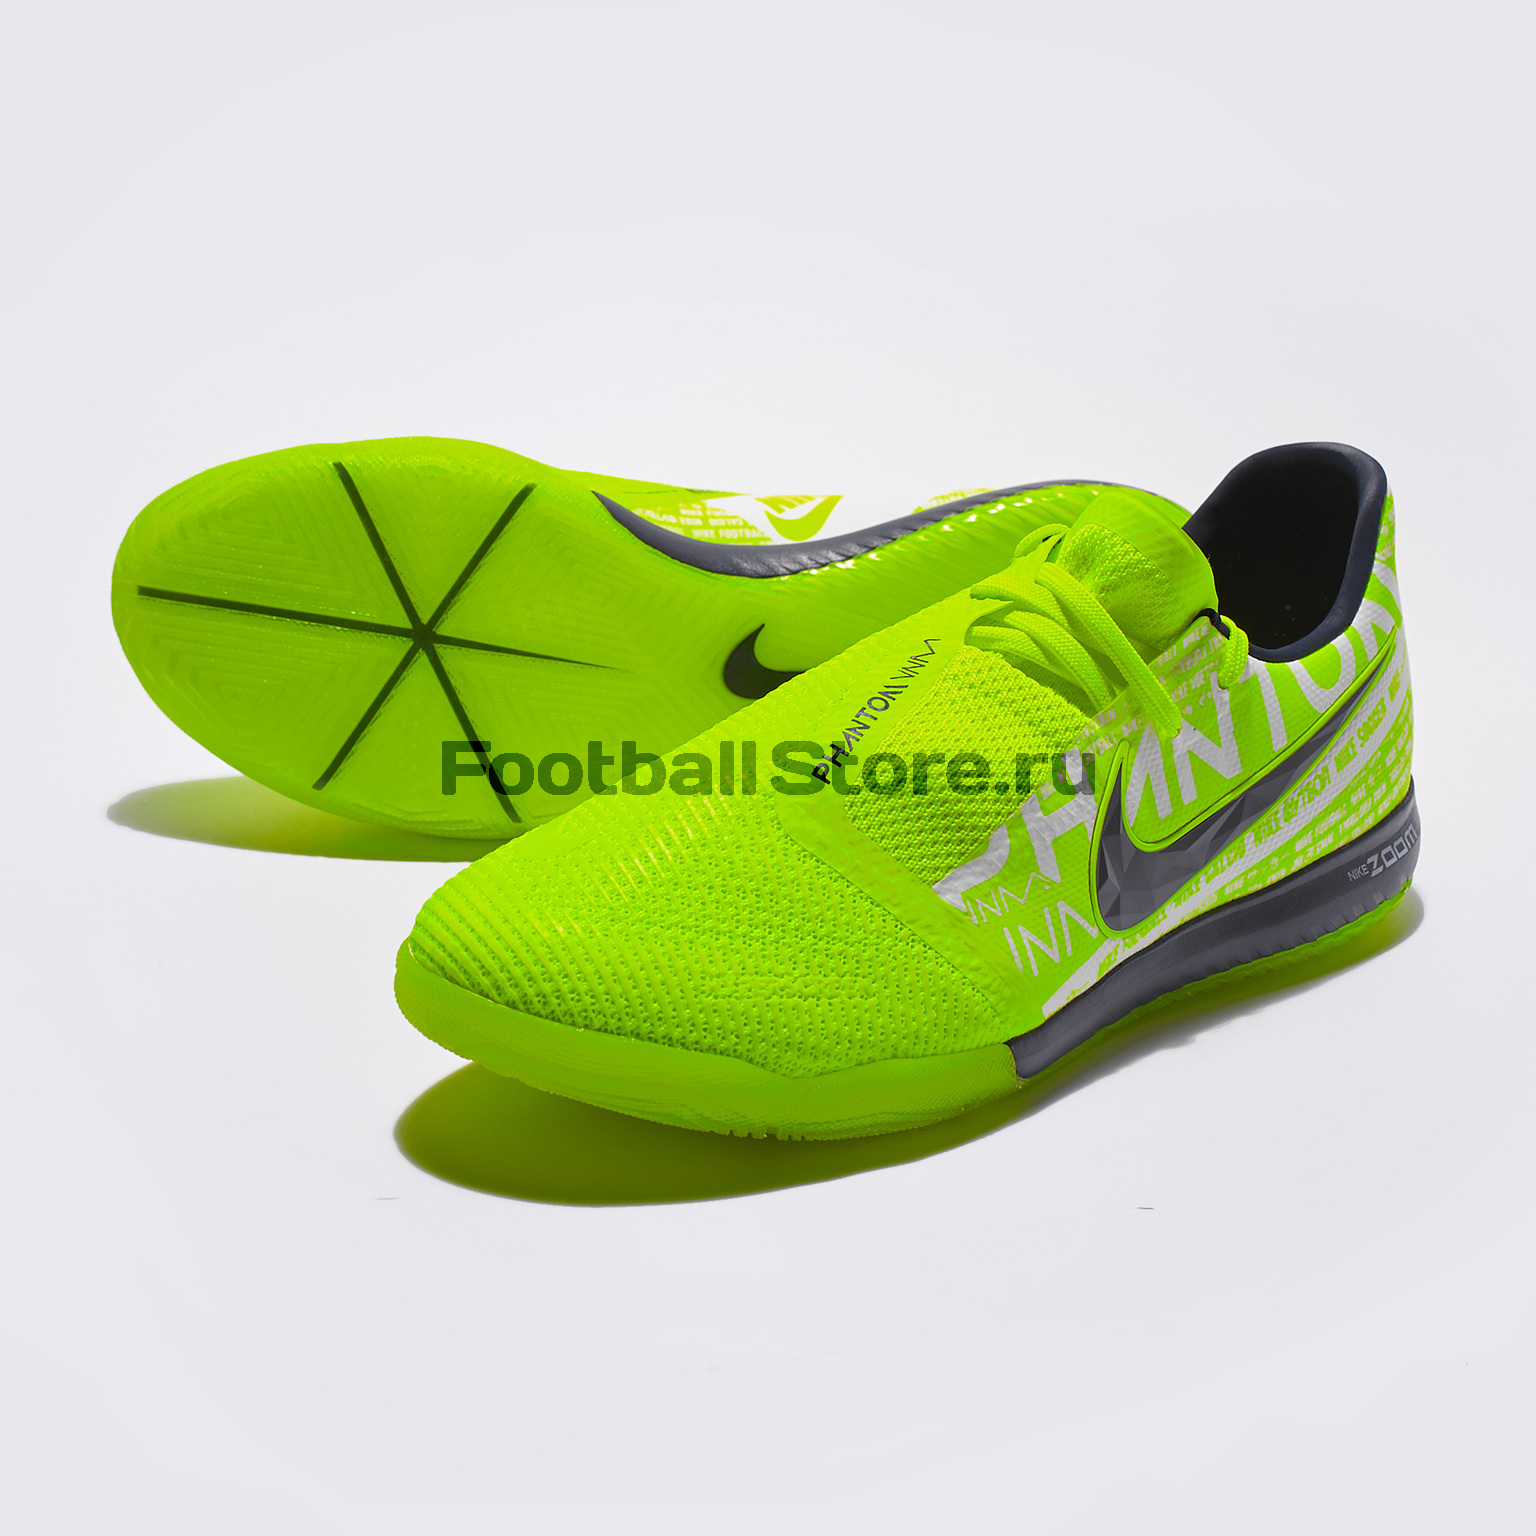 Футзалки Nike Zoom Phantom Venom Pro IC BQ7496-717